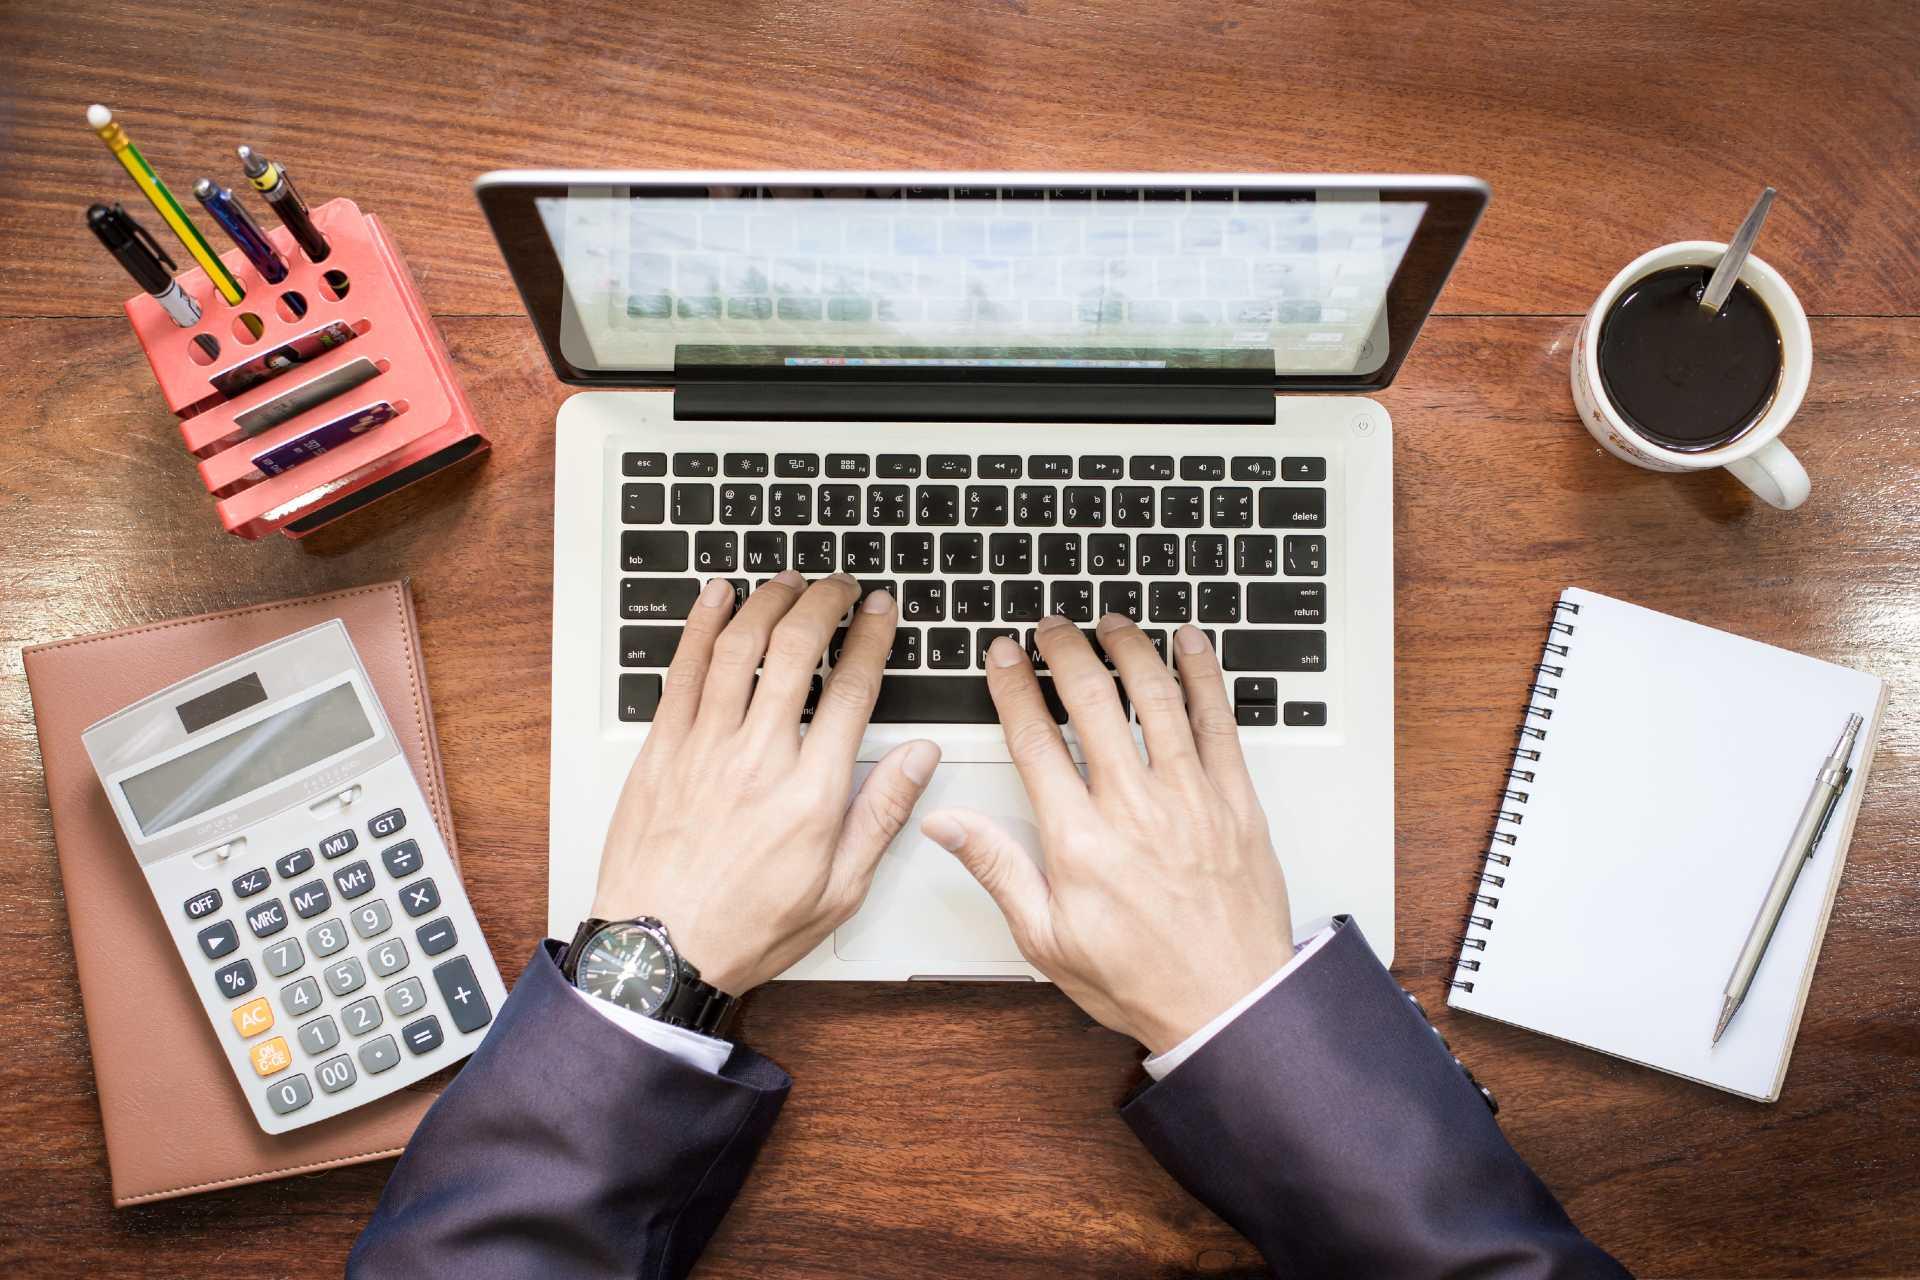 Small business on social media